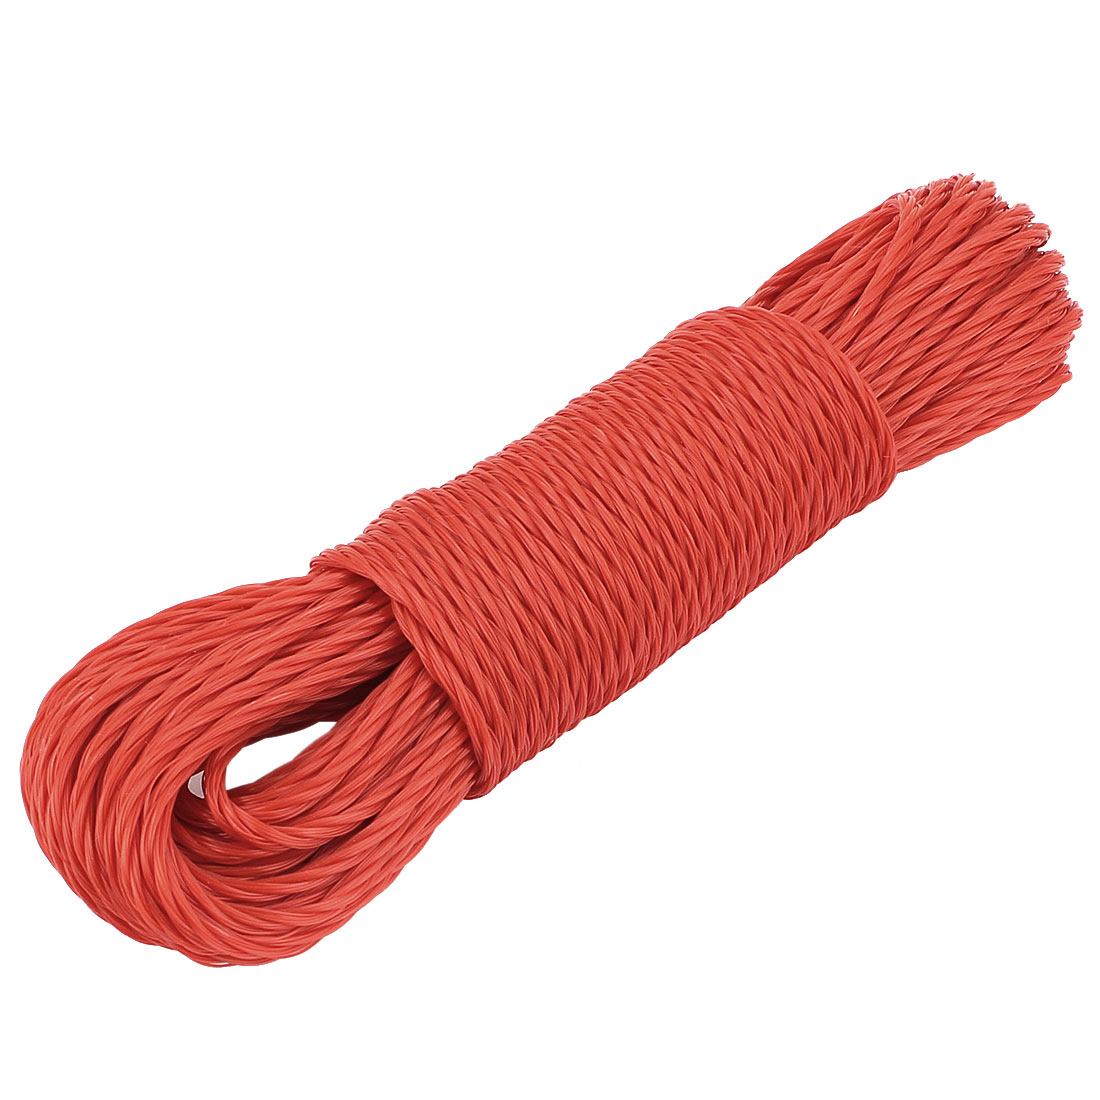 65.6Ft Nylon Household Fishing Camping Multipurpose Nonslip Hanging Clothing Clothesline Rope Green